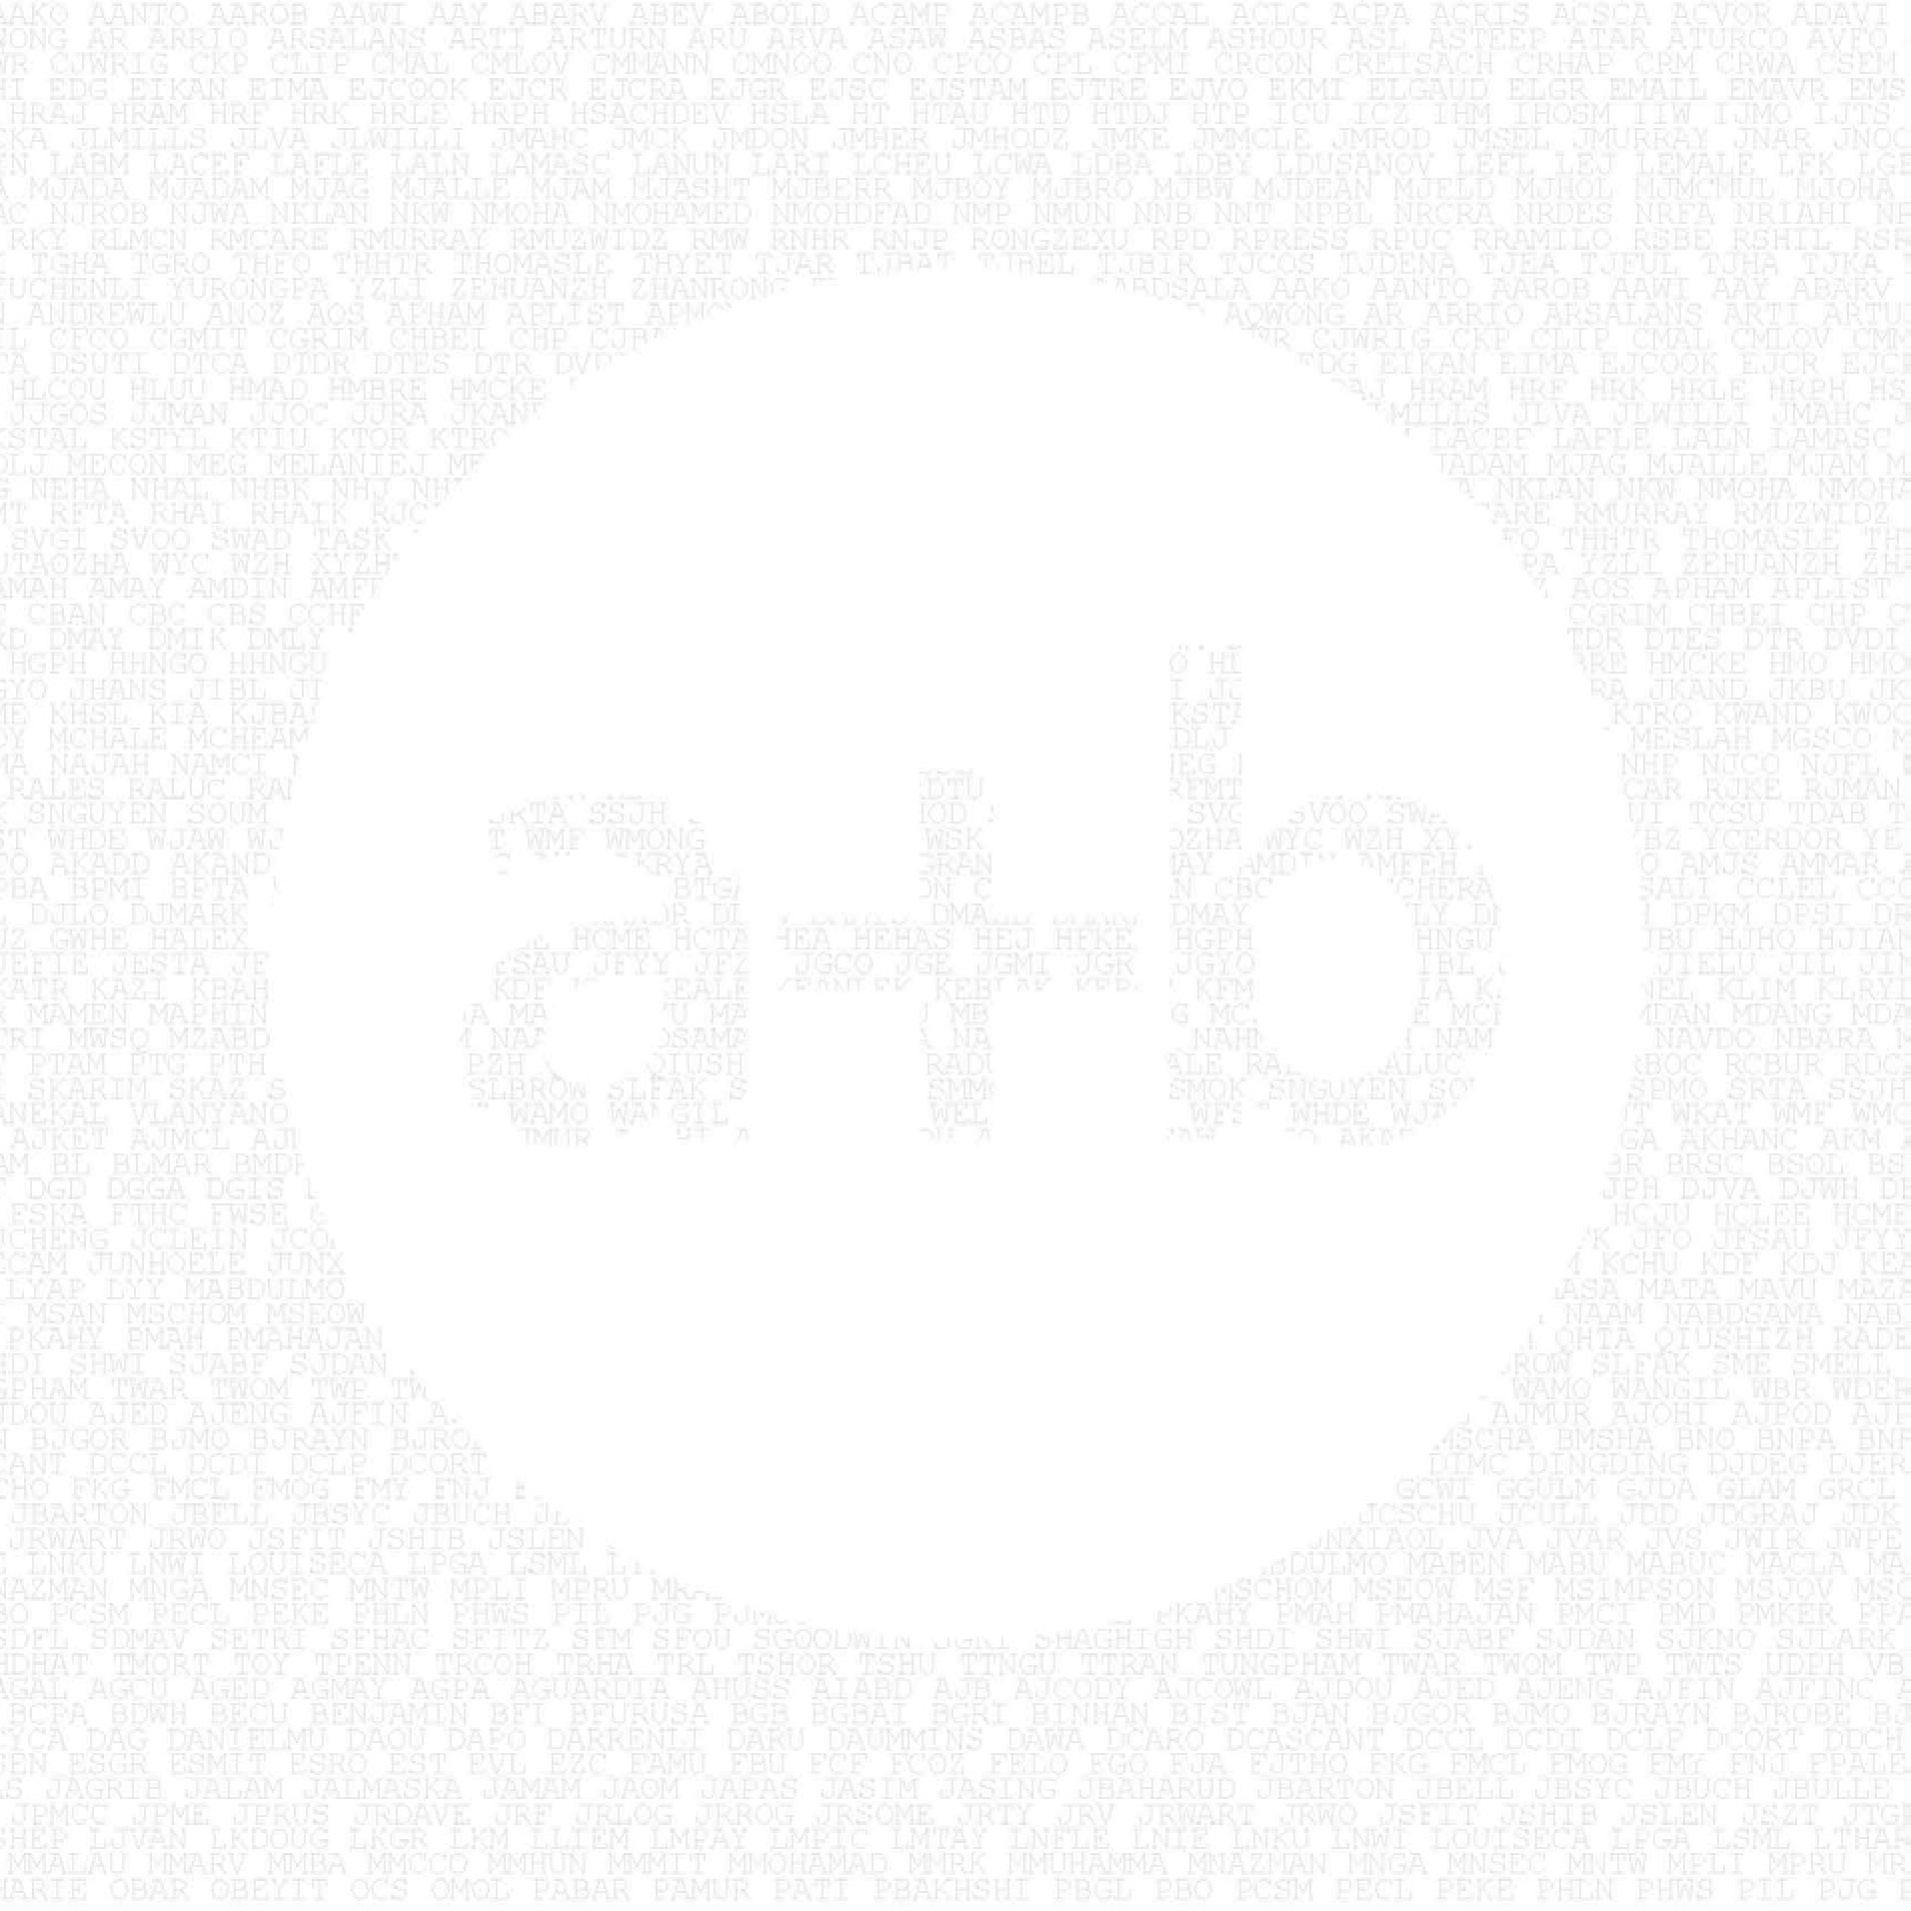 a+bJournal2010-web_Page_01.jpg